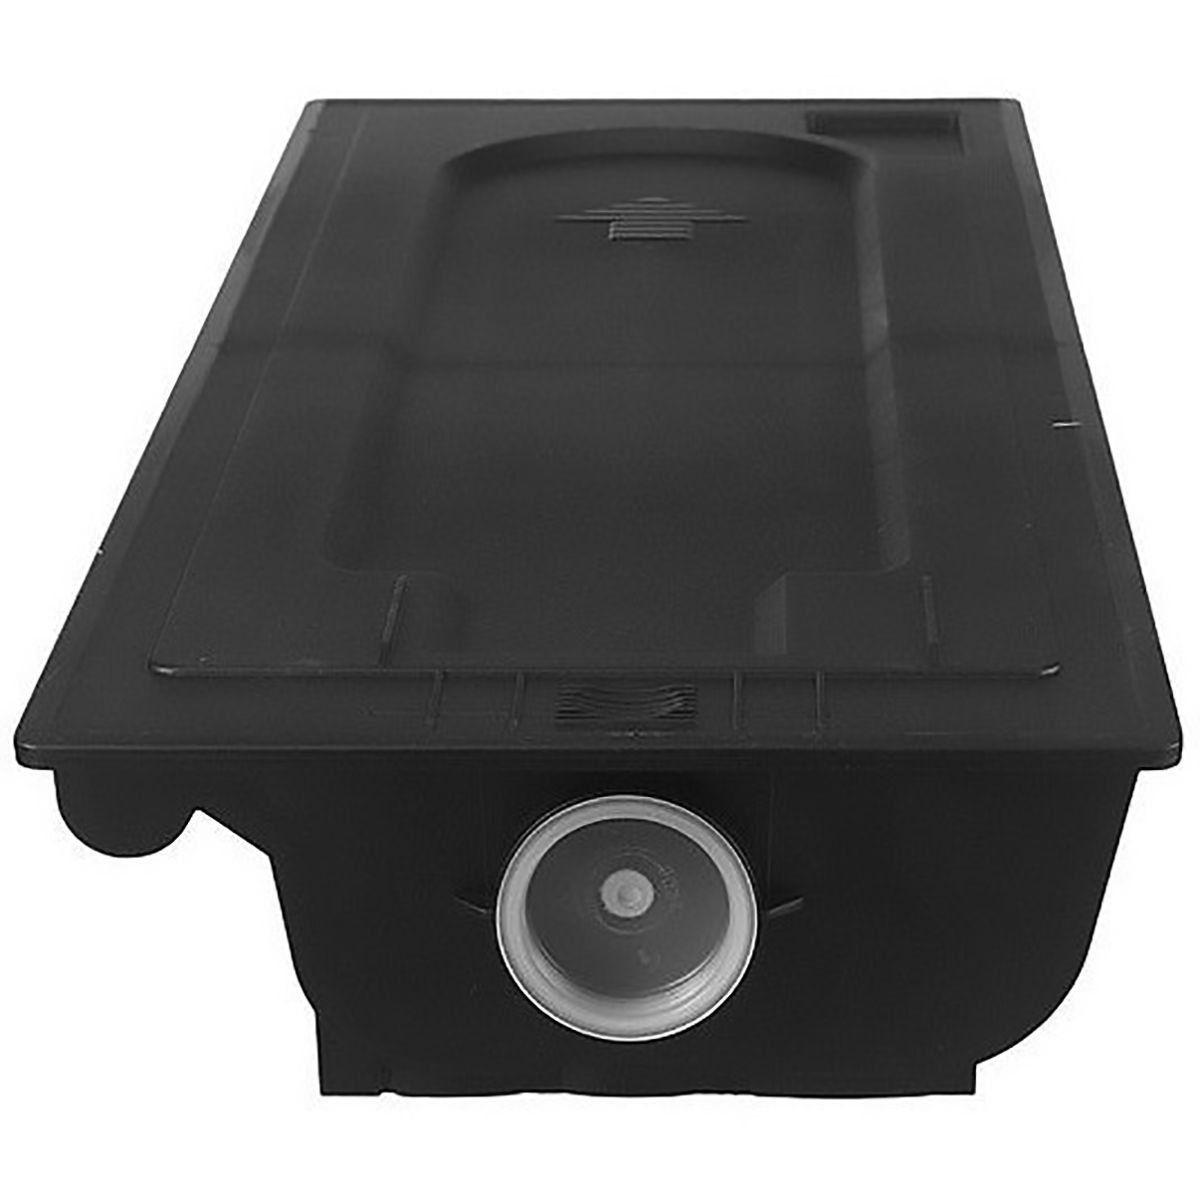 Compatível: Toner TK411 TK410 para Kyocera KM1620 KM1635 KM1650 KM2020 KM2035 KM2050 KM2550 / Preto / 15.000